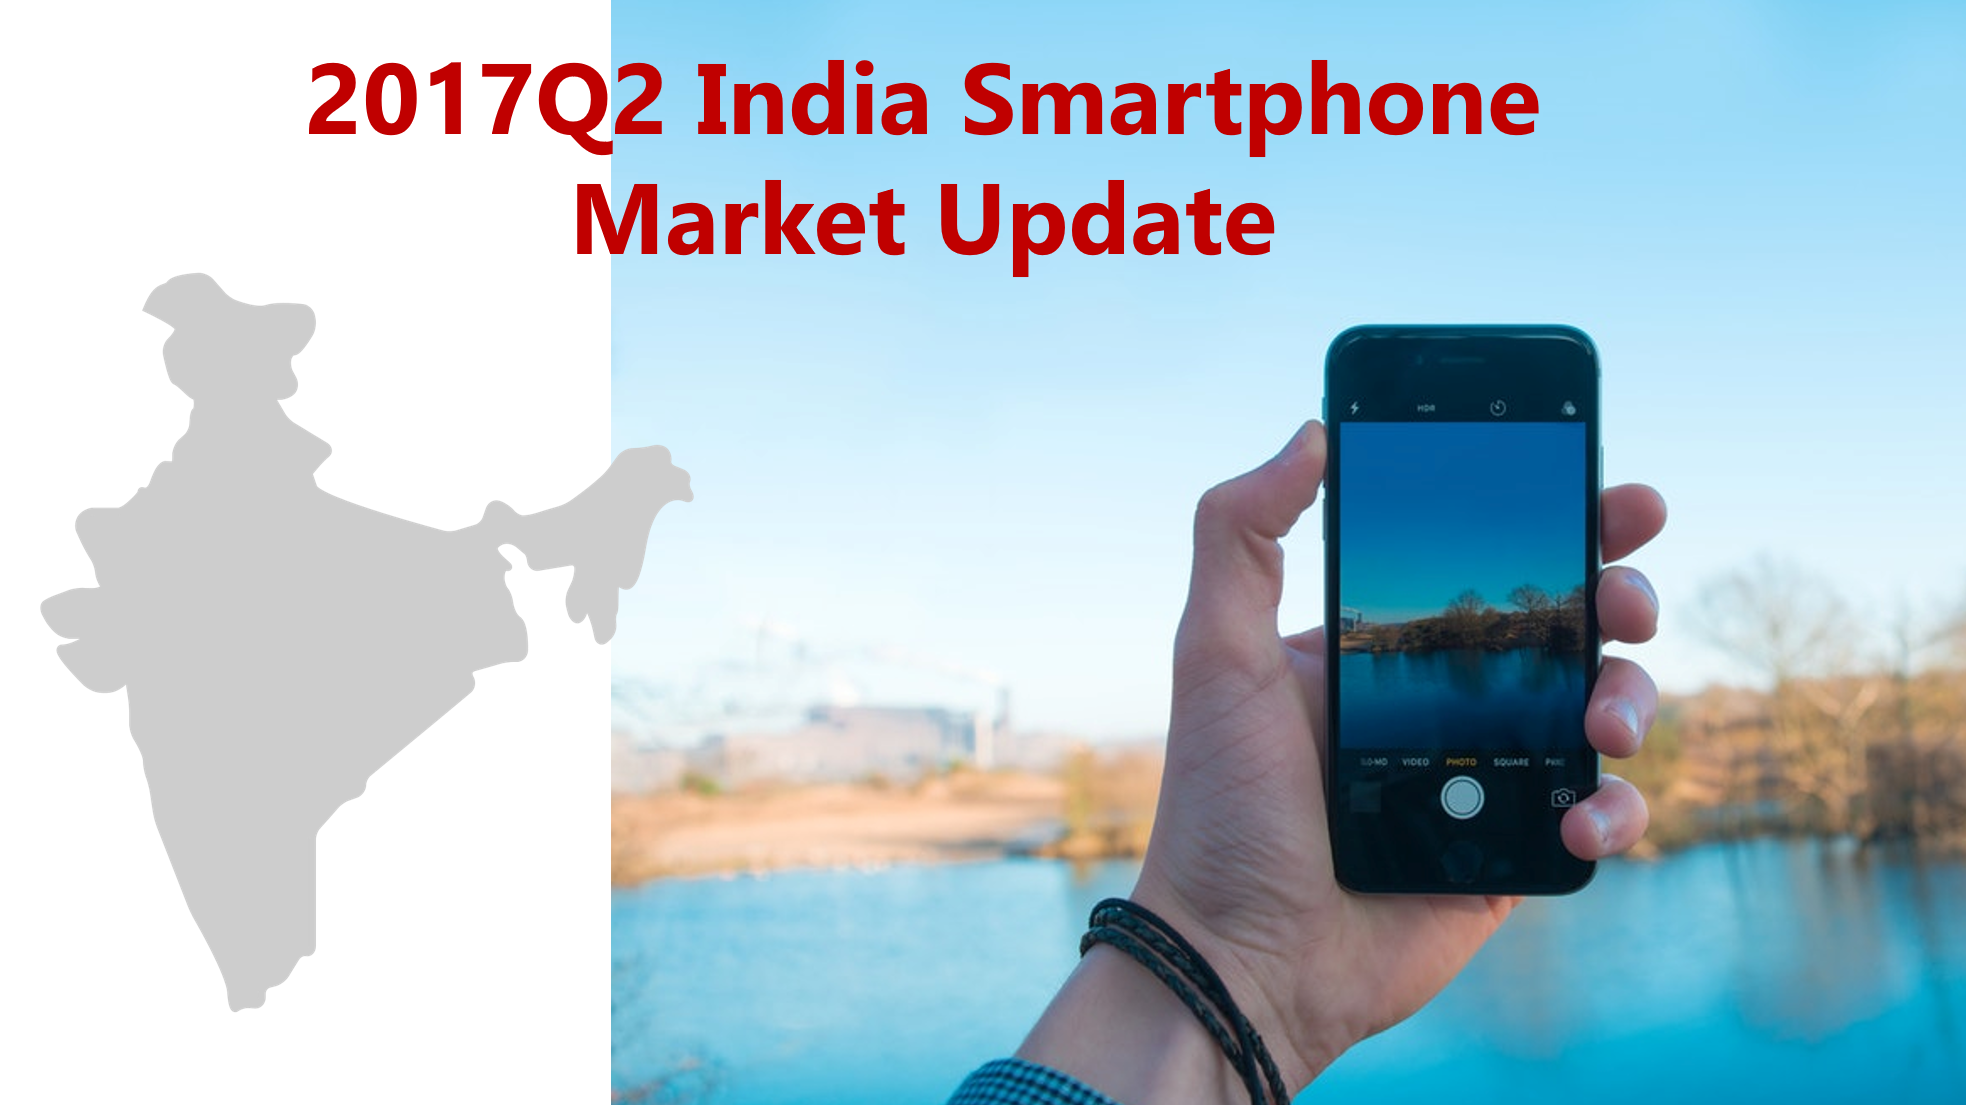 India Smartphone Market Update – Q2 2017